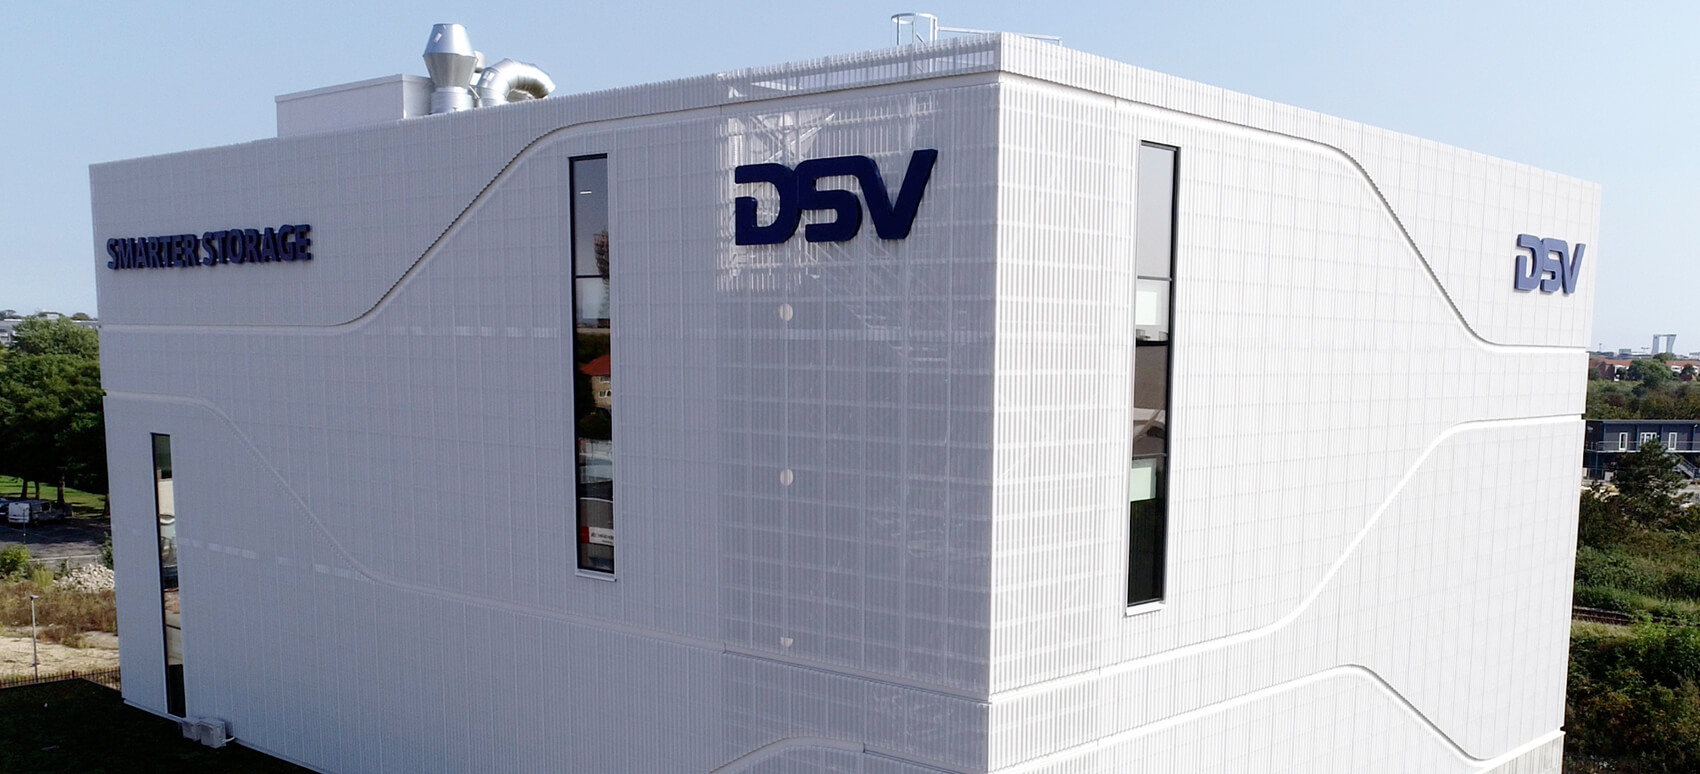 DSV Smarter Storage i Valby